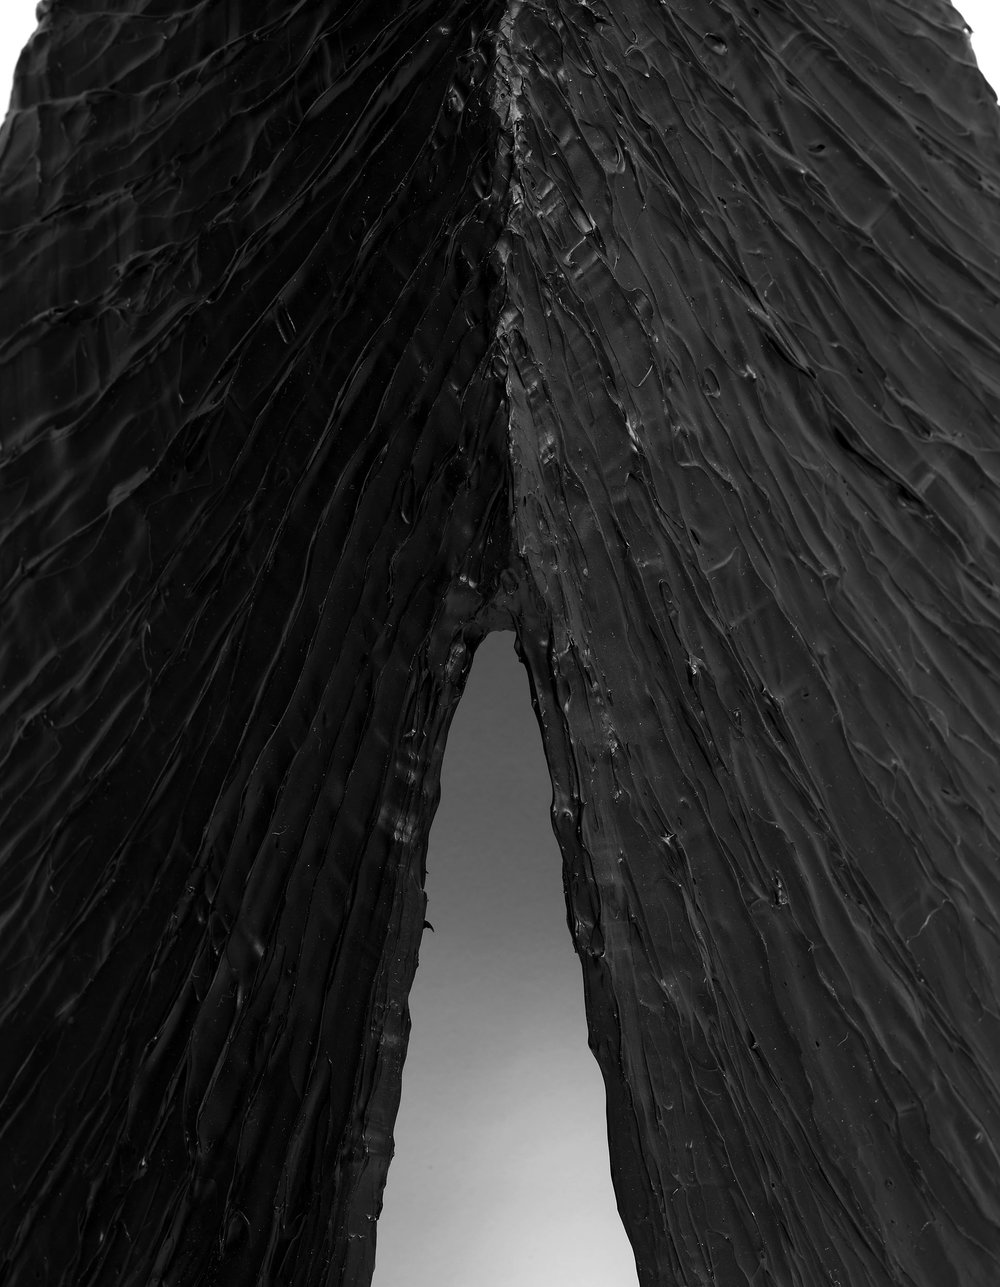 Mussel,-Plywood,-blackboard-paint,-gel-medium,-acrylic-paint,-47-x-24-x-11cm,-2012-(detail).jpg